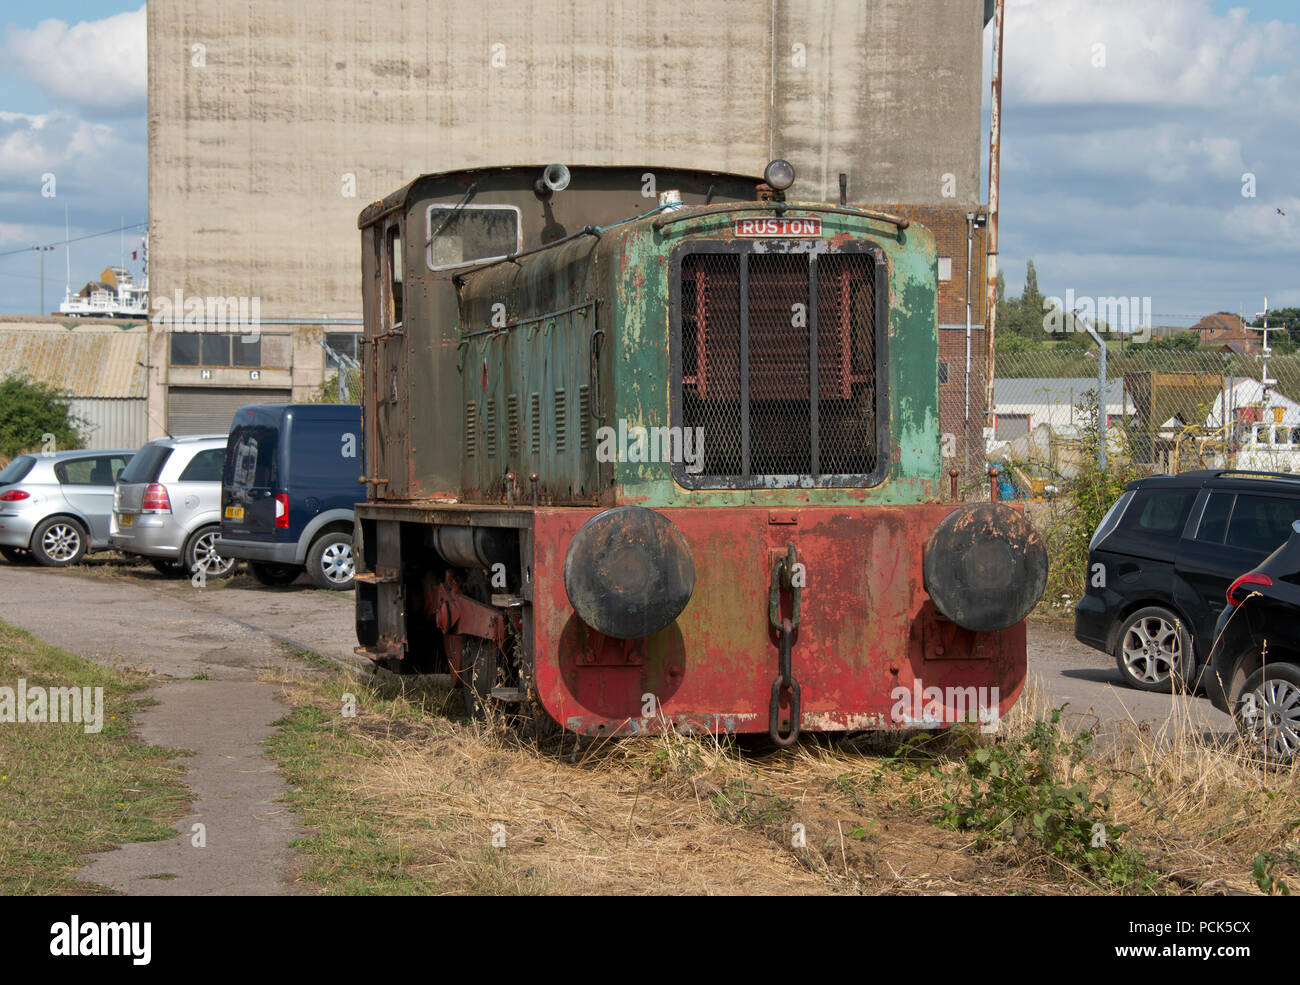 A Ruston diesel locomotive shunting engine at Sharpness Docks, Gloucestershire, United Kingdom - Stock Image